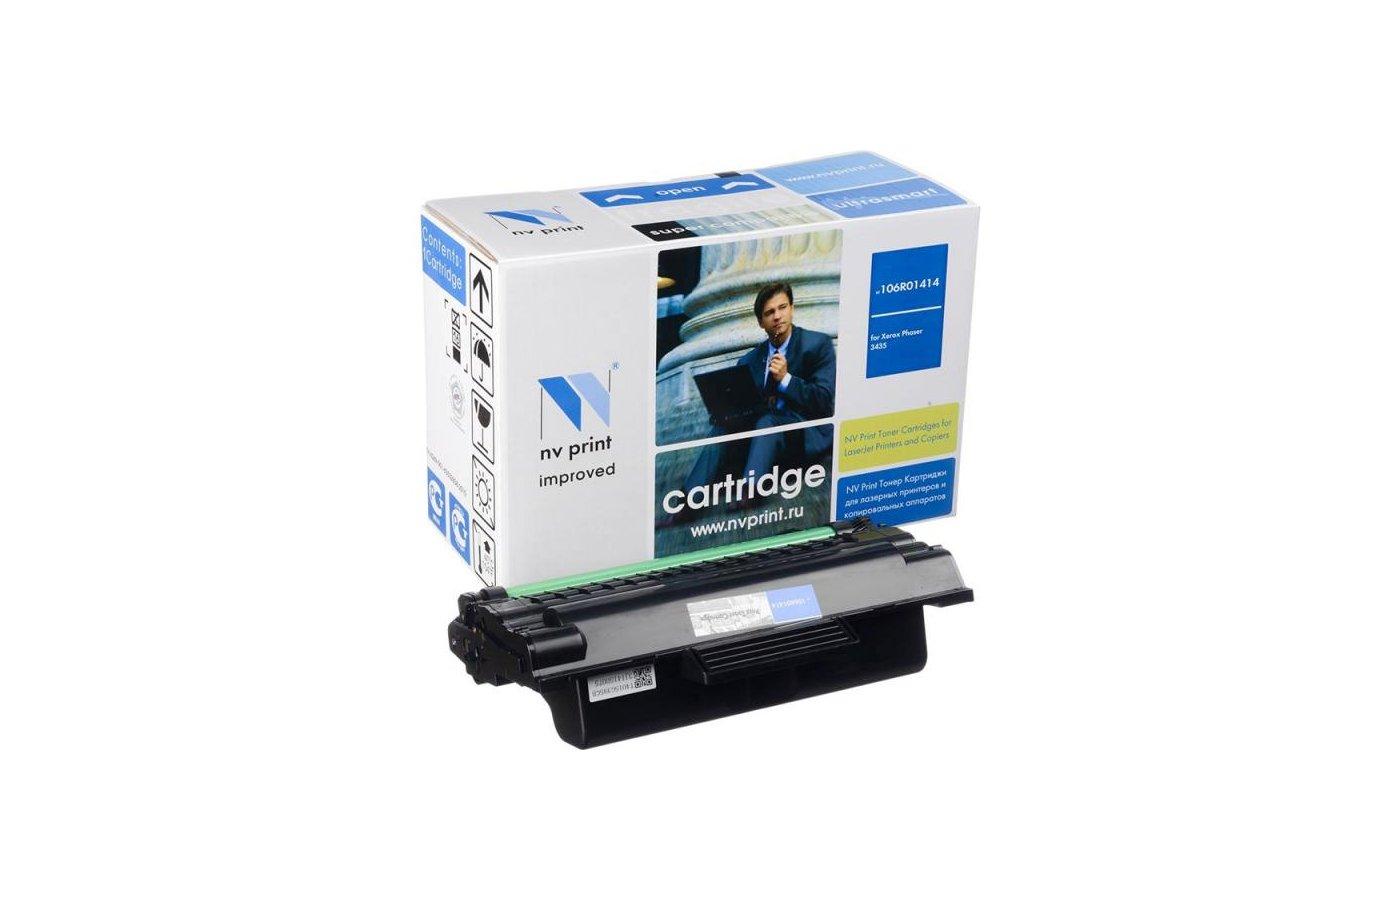 Картридж лазерный NV Print совместимый Xerox для Phaser 3435. Чёрный. 4000 страниц. (106R01414)